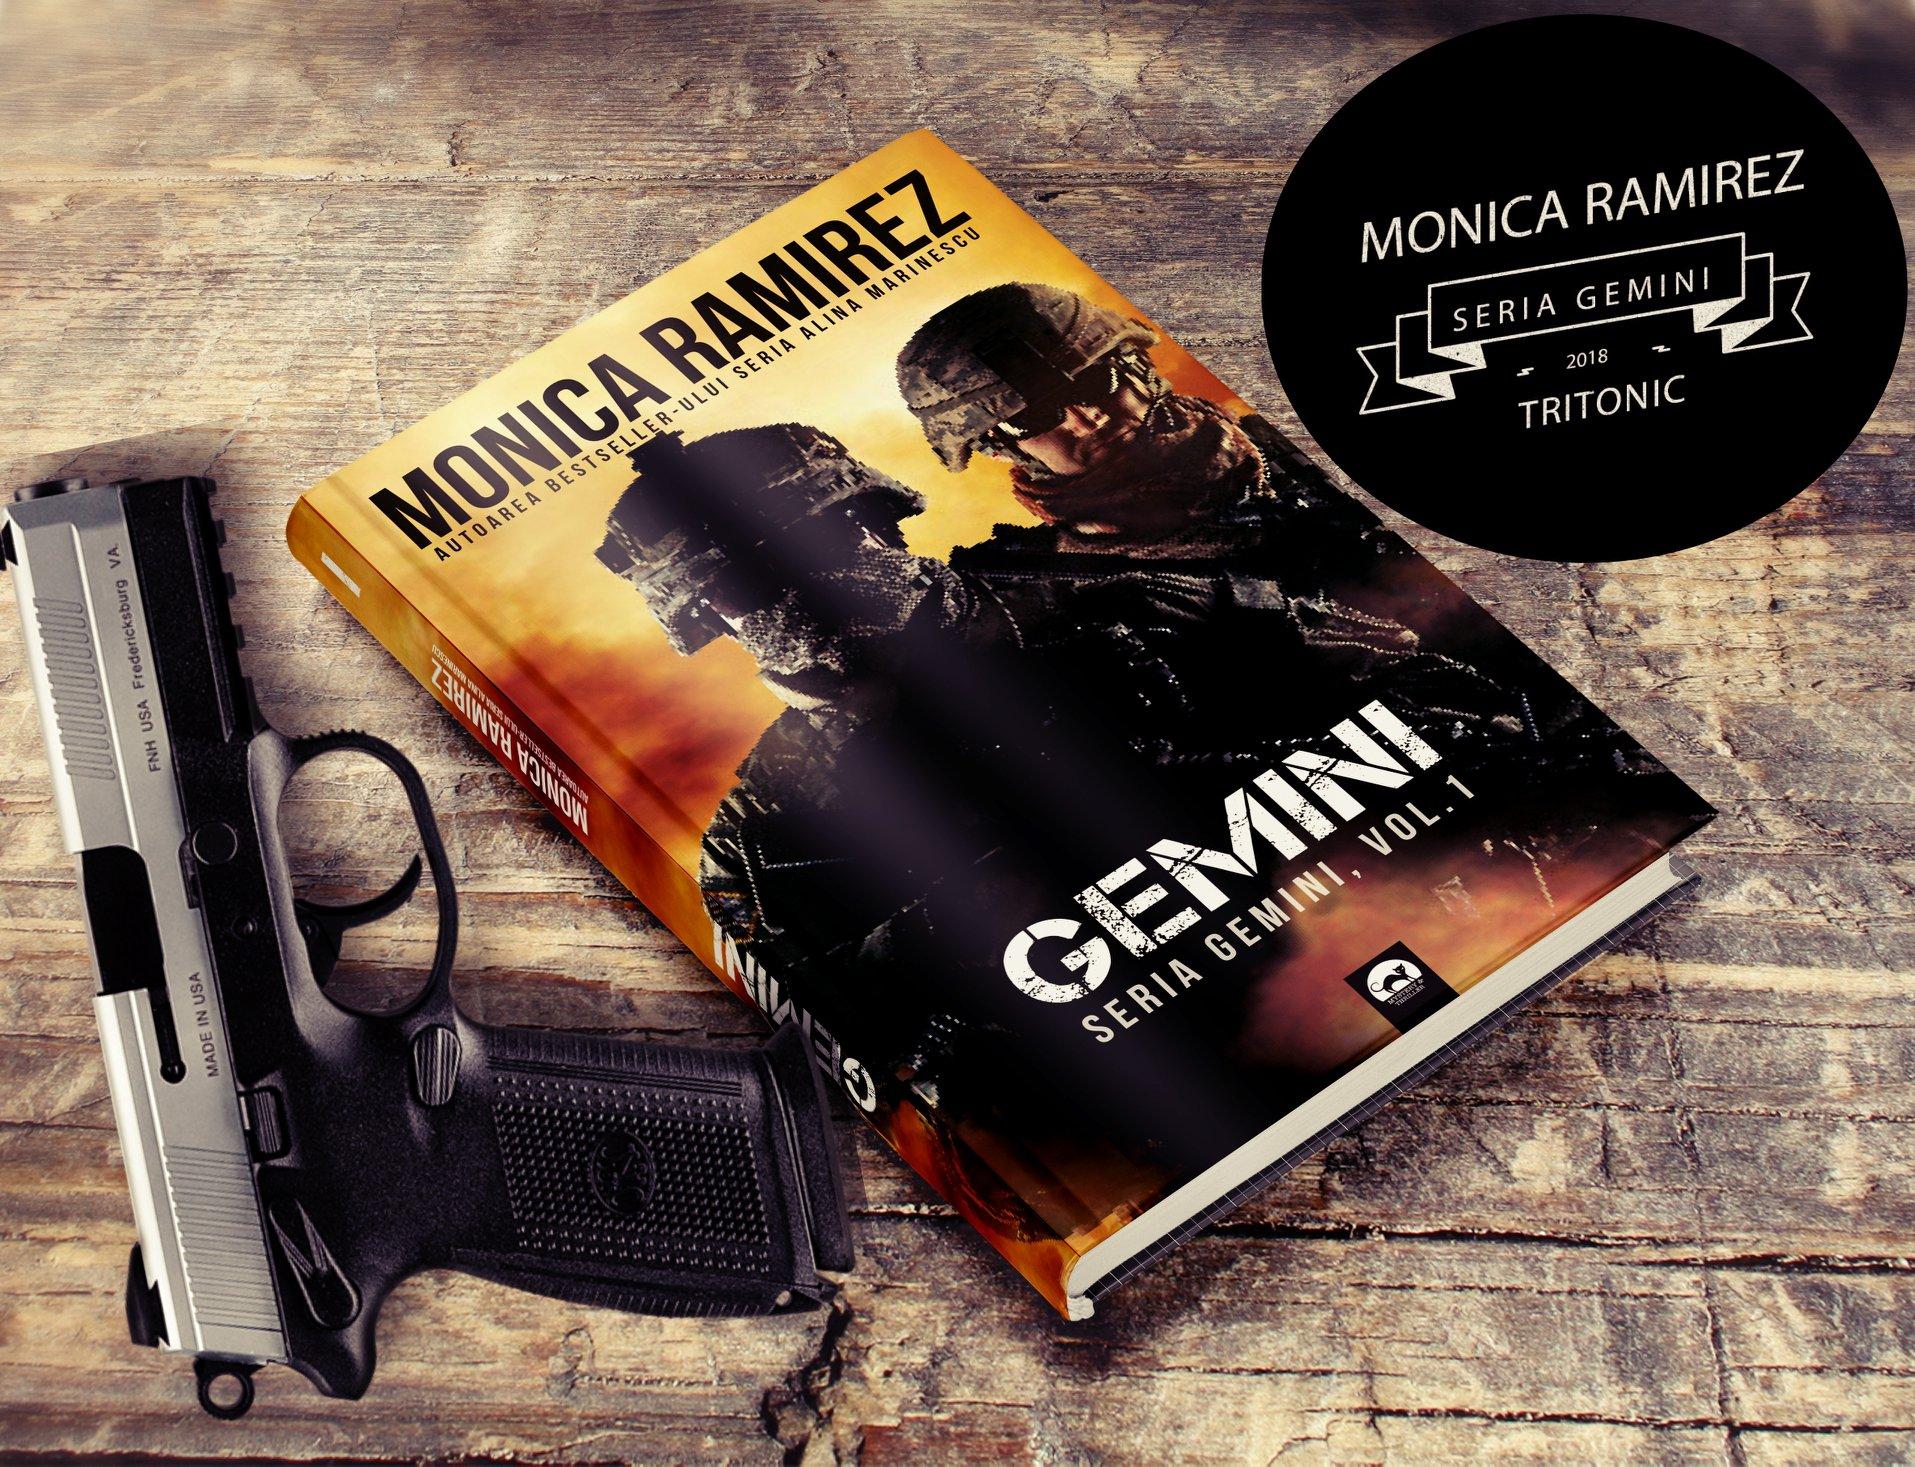 Gemini Vol. 1 de Monica Ramirez